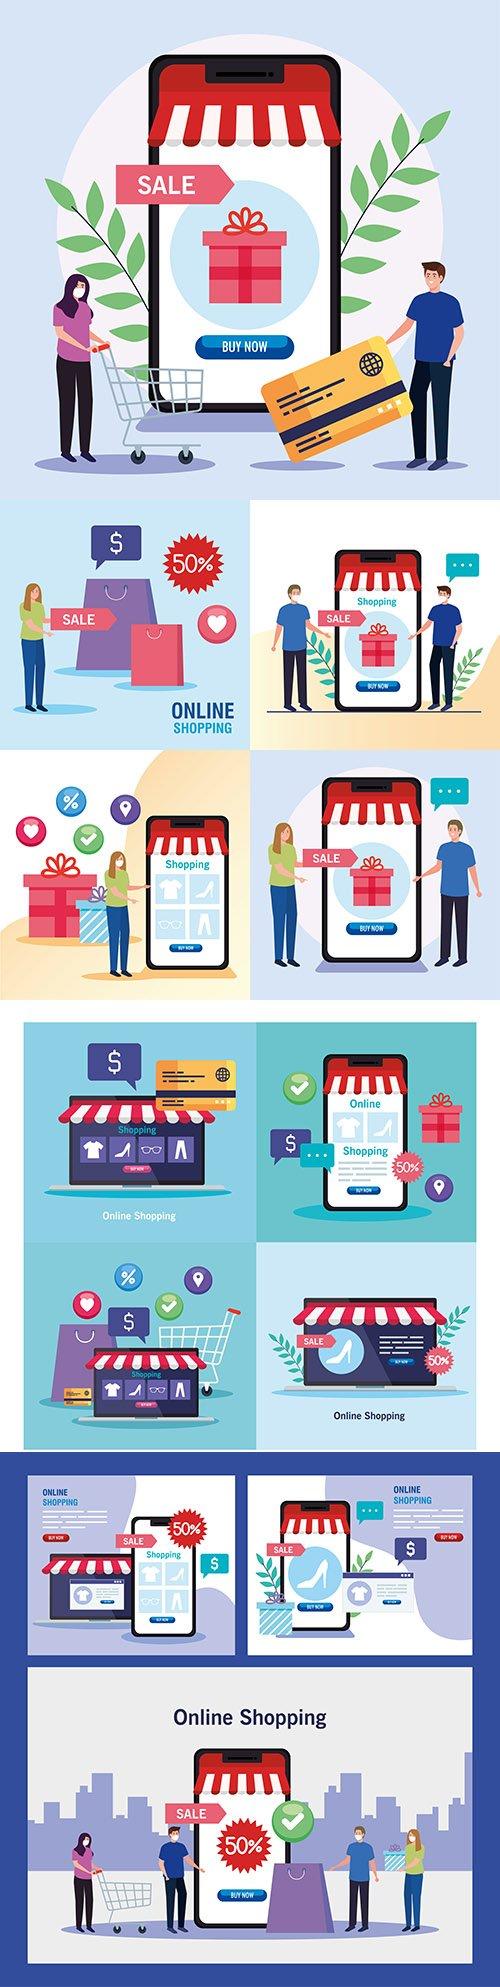 Shopping online e-commerce market and retail illustration